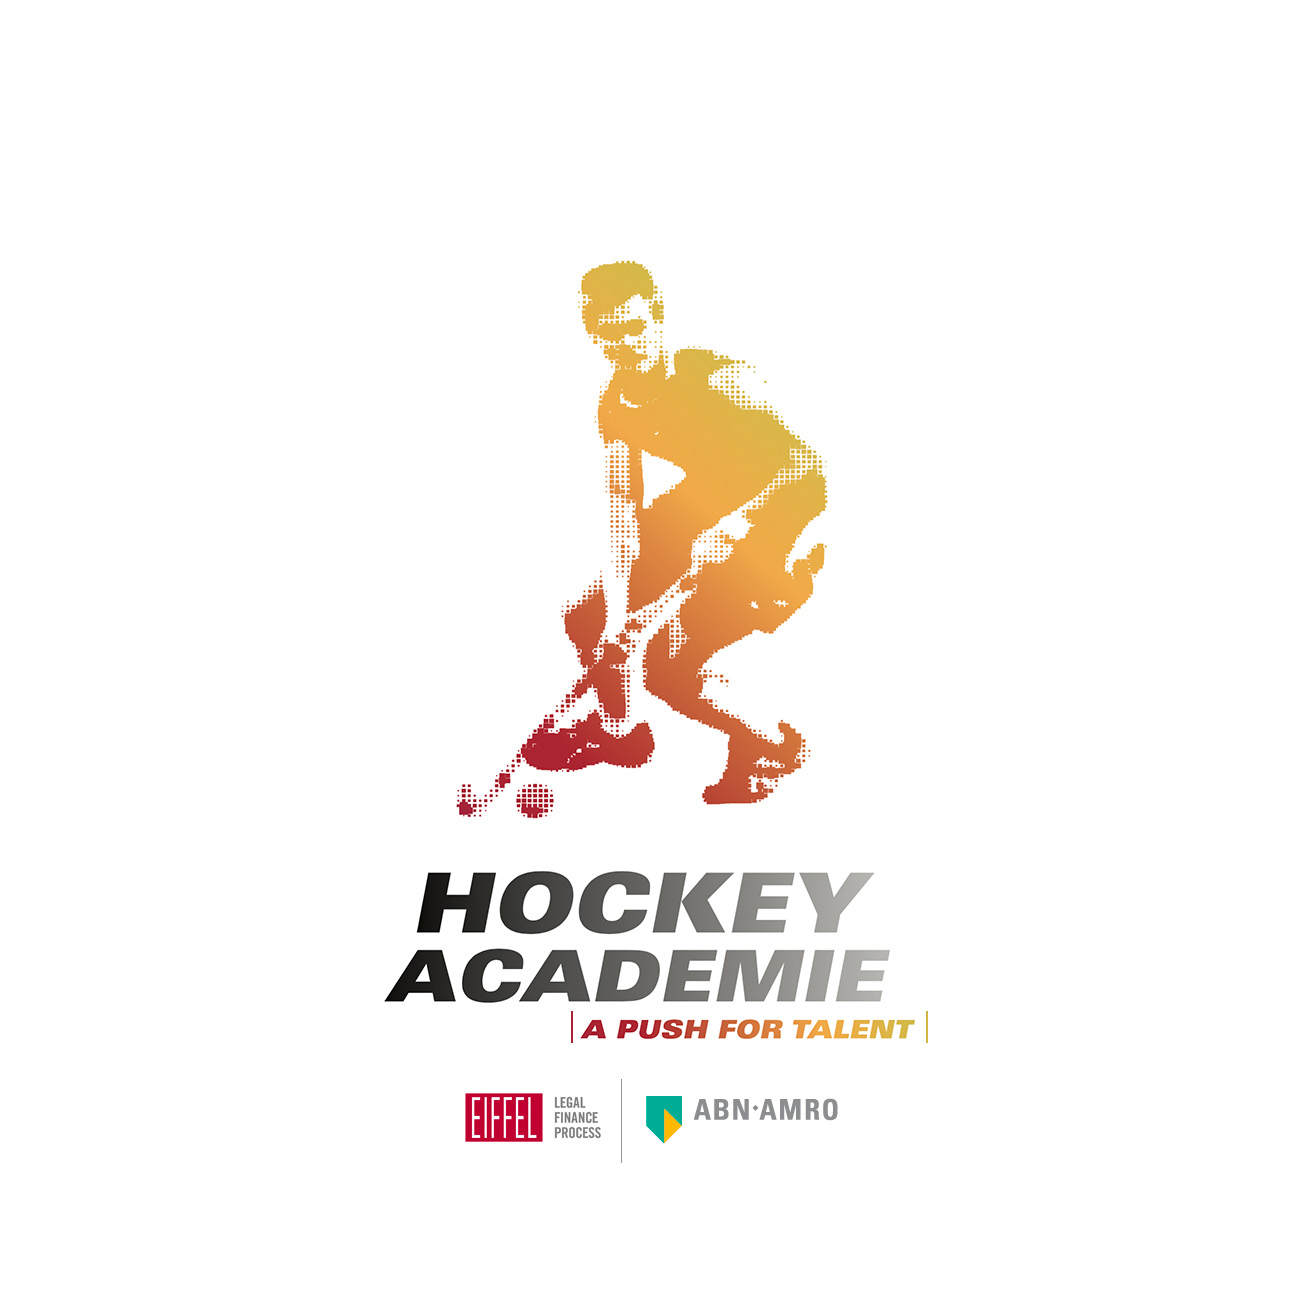 Hockey academie